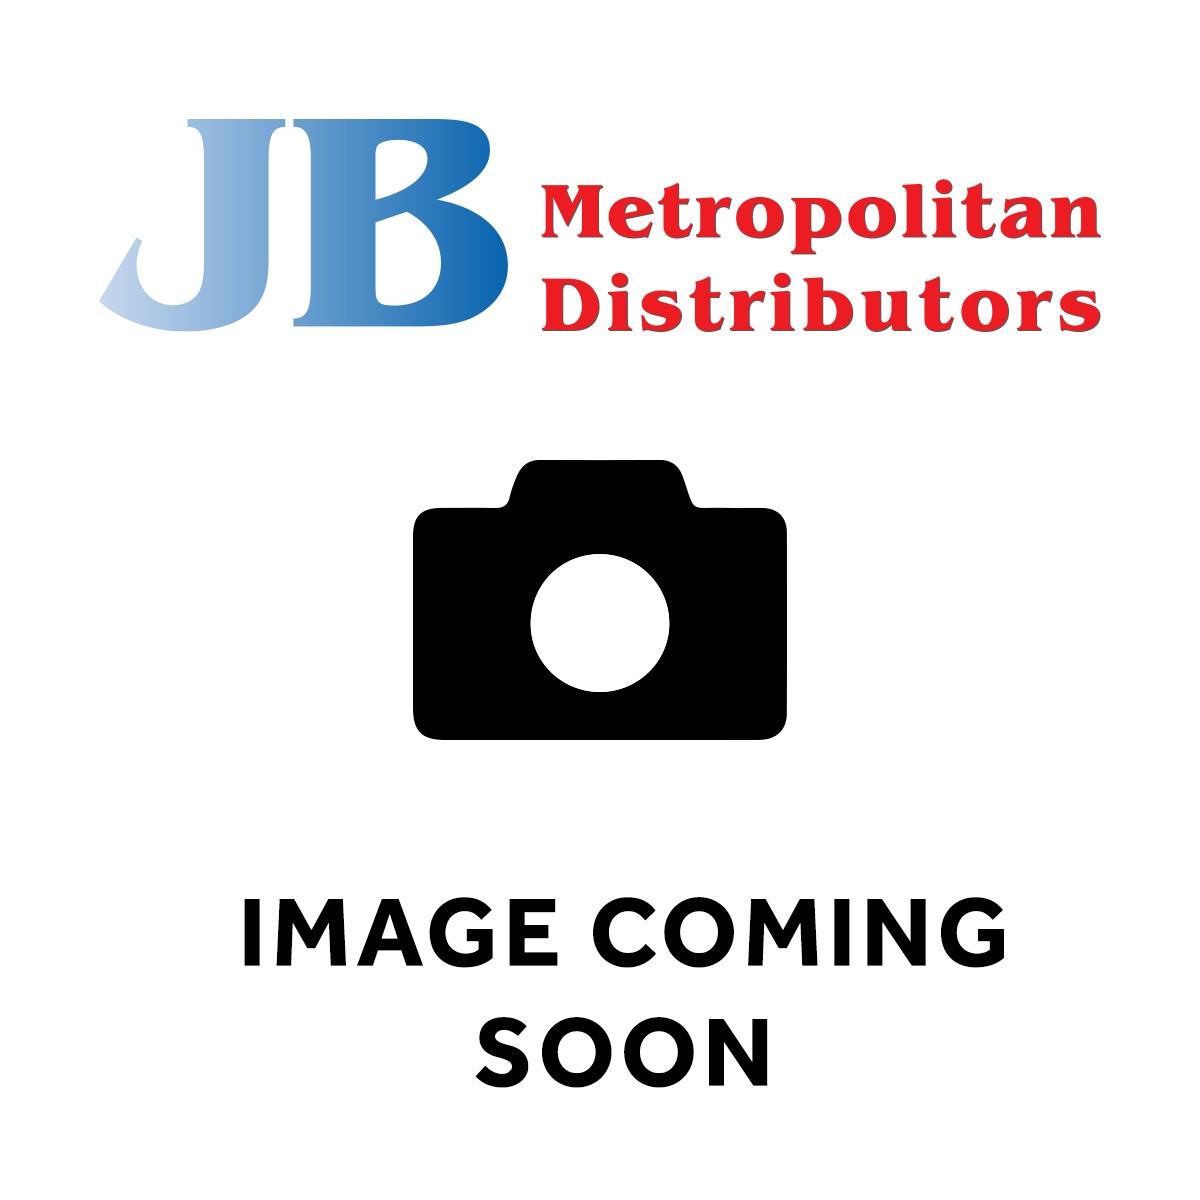 118G AERO PEPPERMINT BLOCK